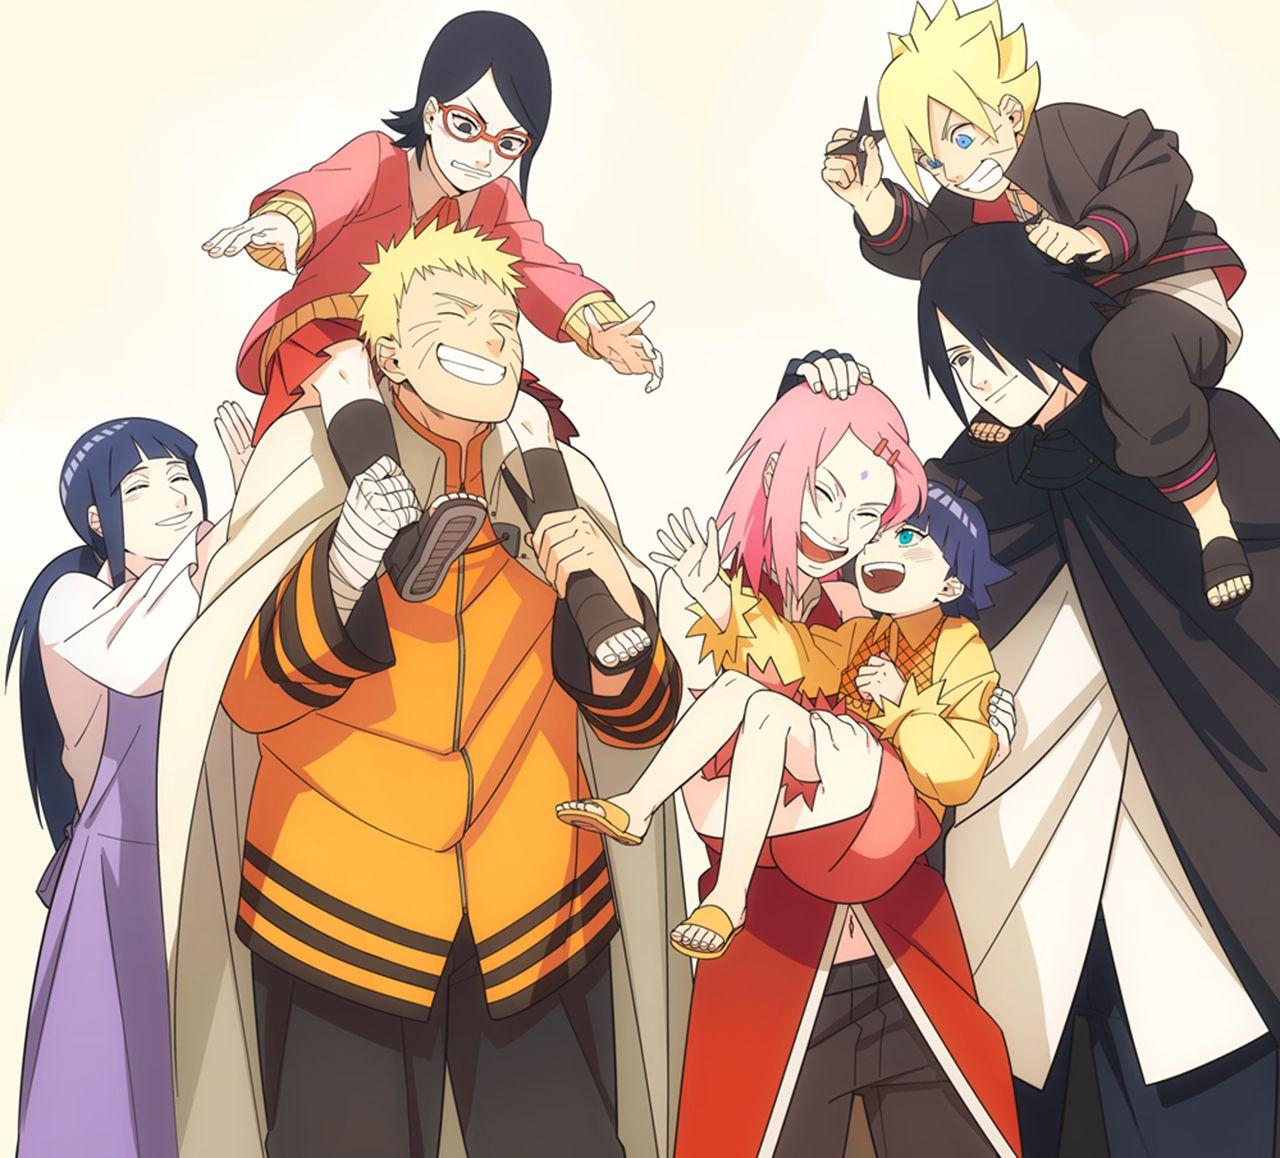 Most Inspiring Wallpaper Naruto Couple - afed06ad25a301a1e123122df41342b4  2018_707989.jpg